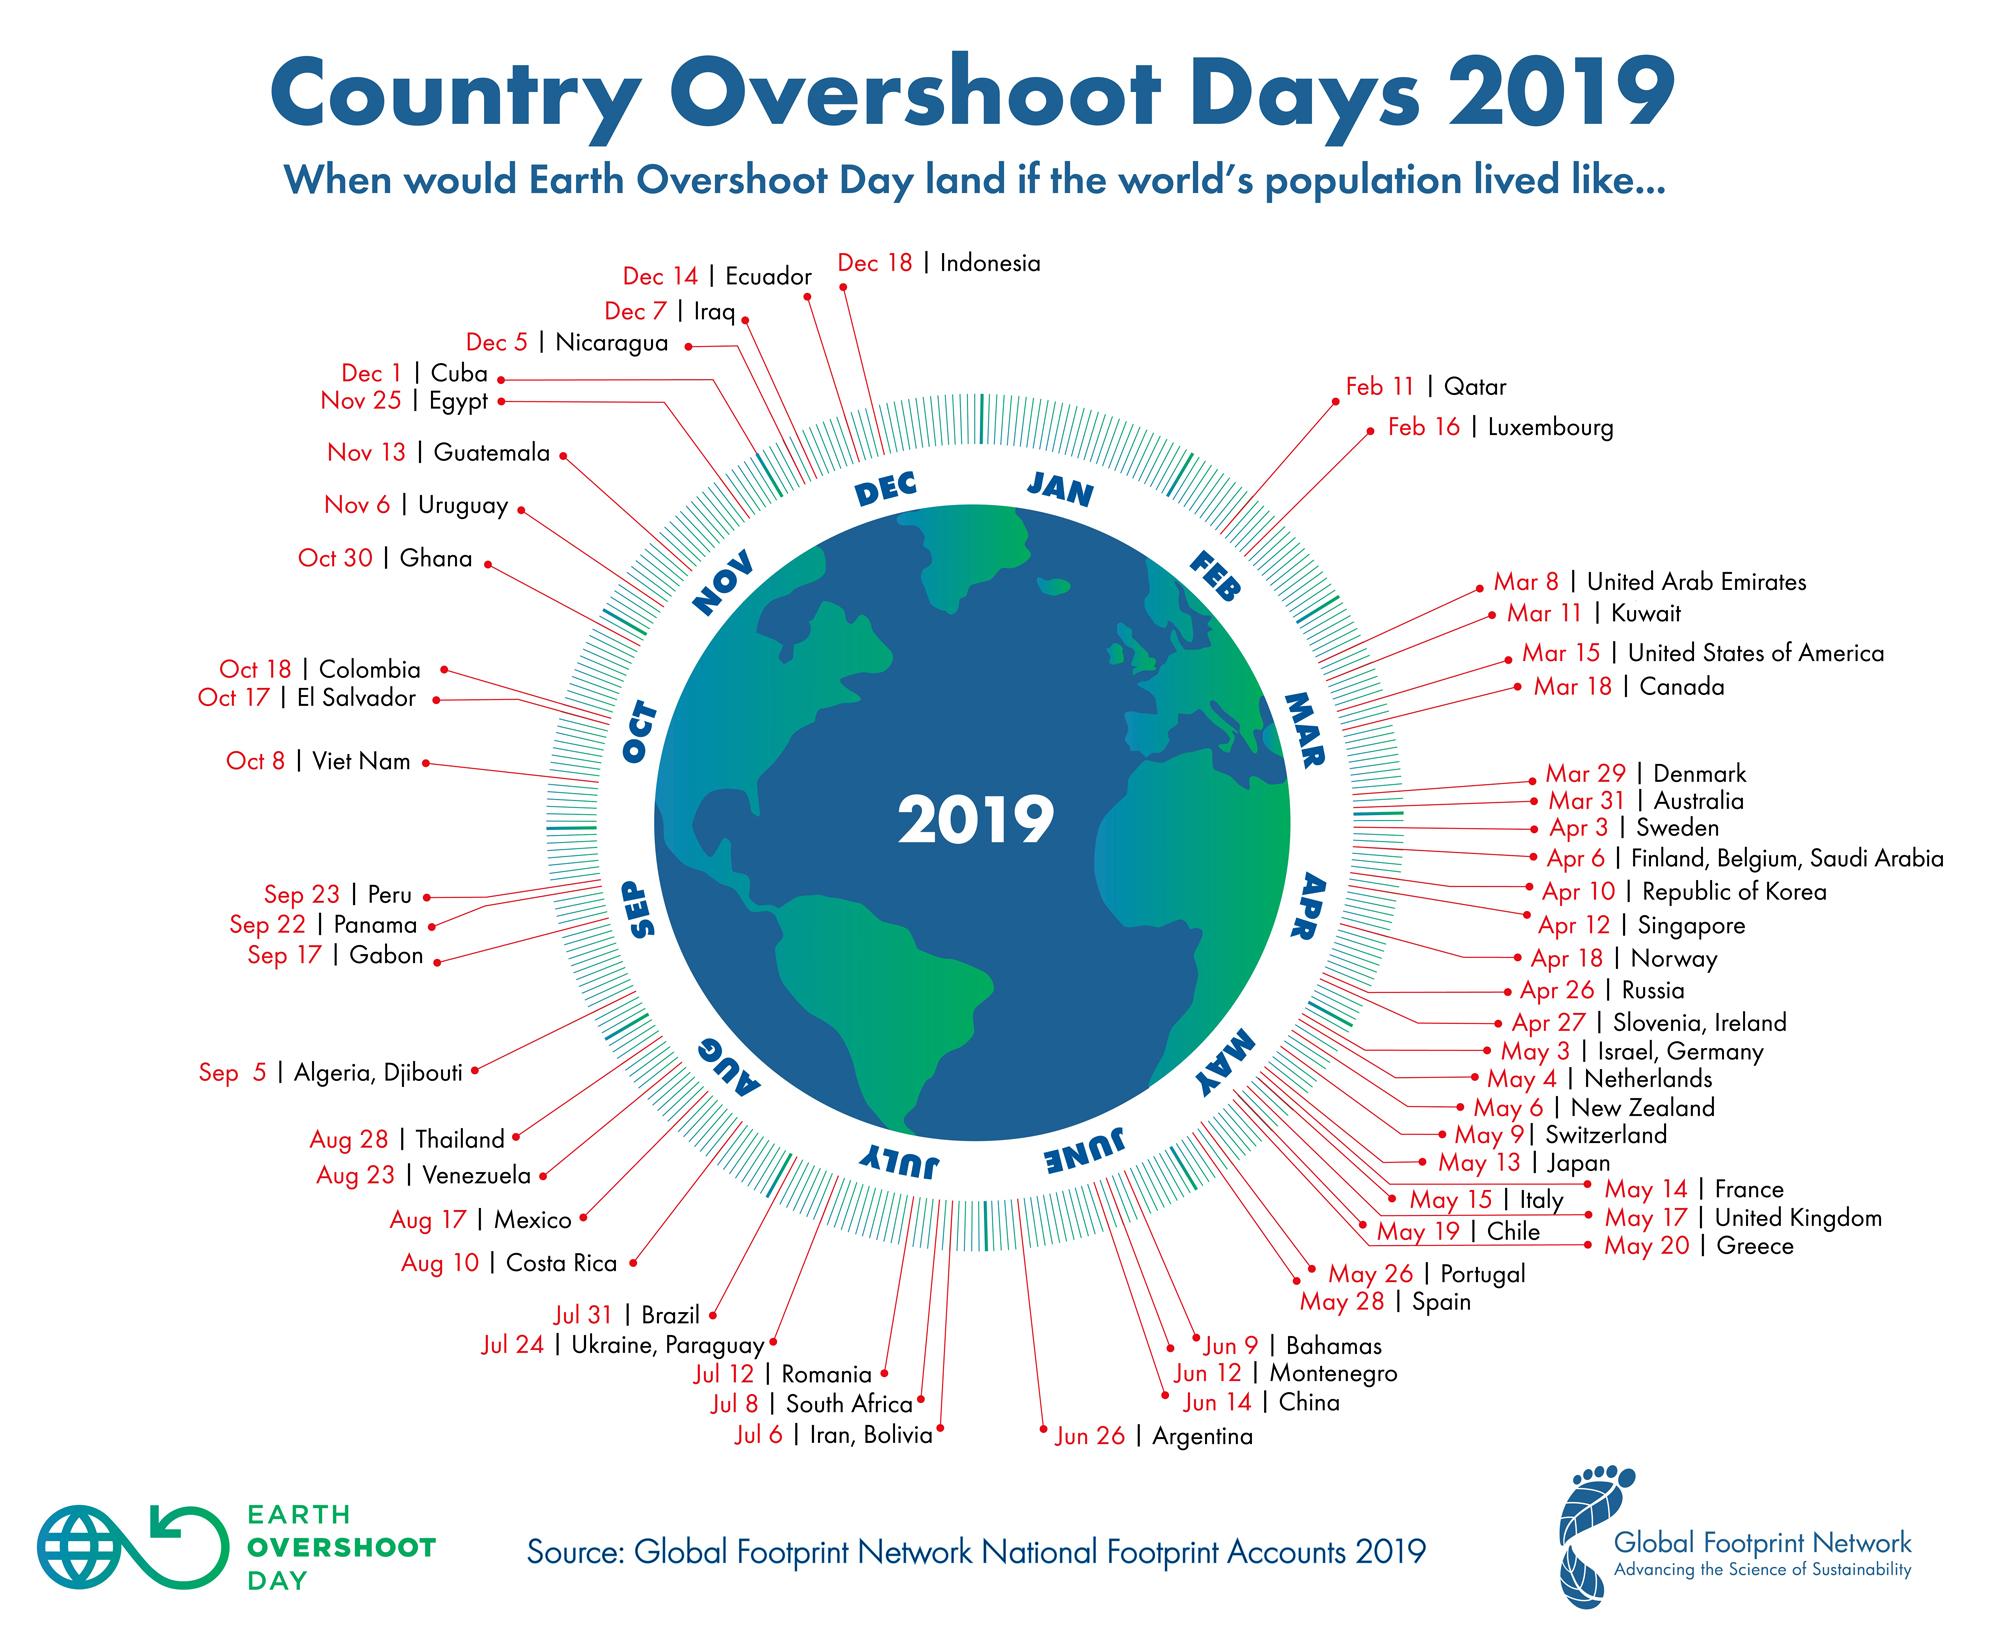 2019_Country_Overshoot_Days-2000.jpg